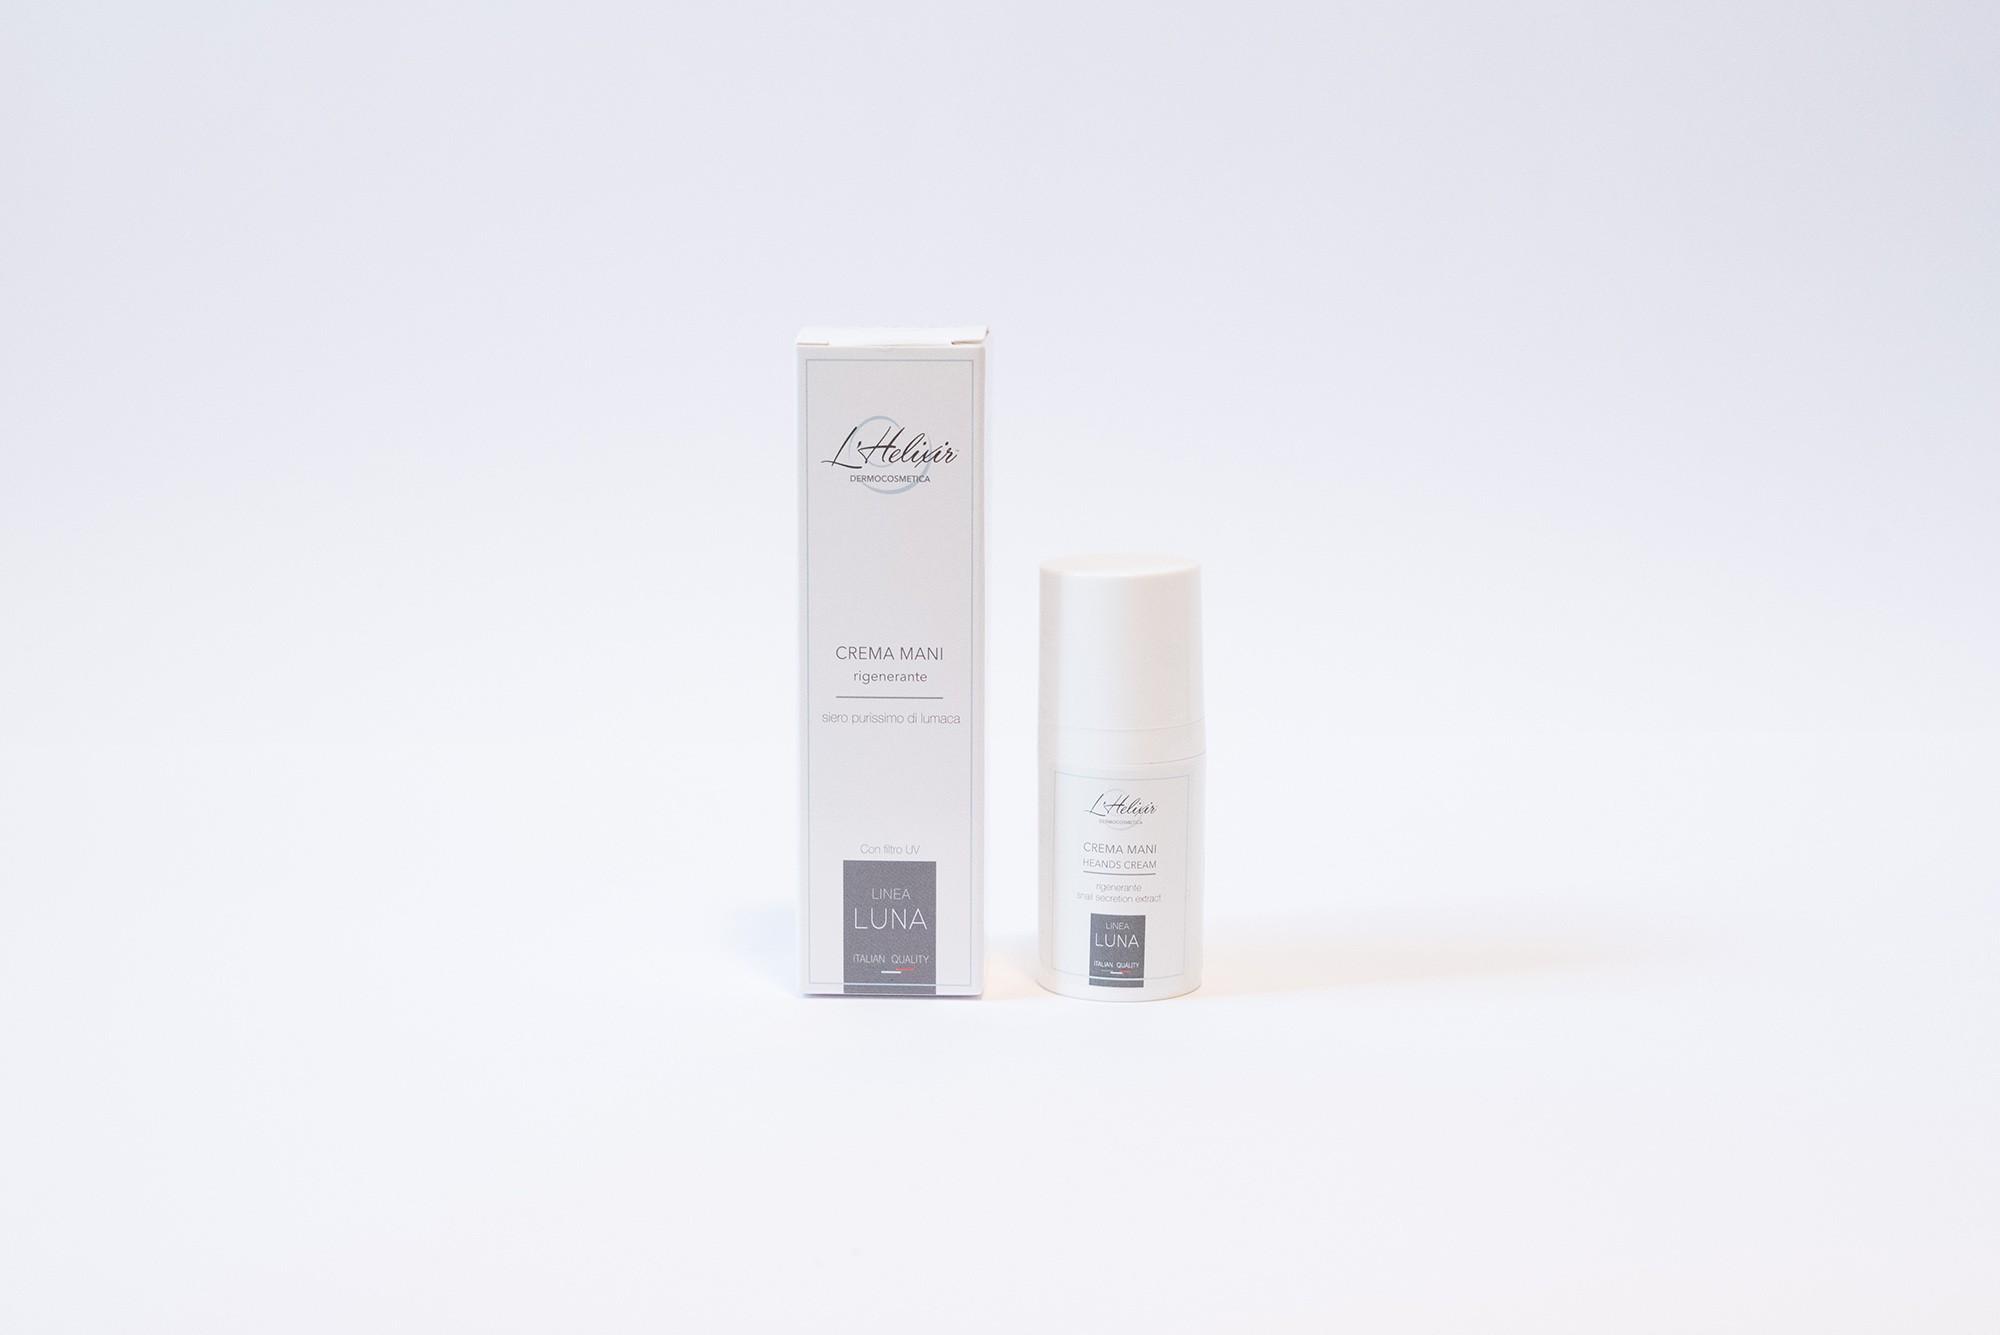 Crema Mani - 50ml - L'Helixir